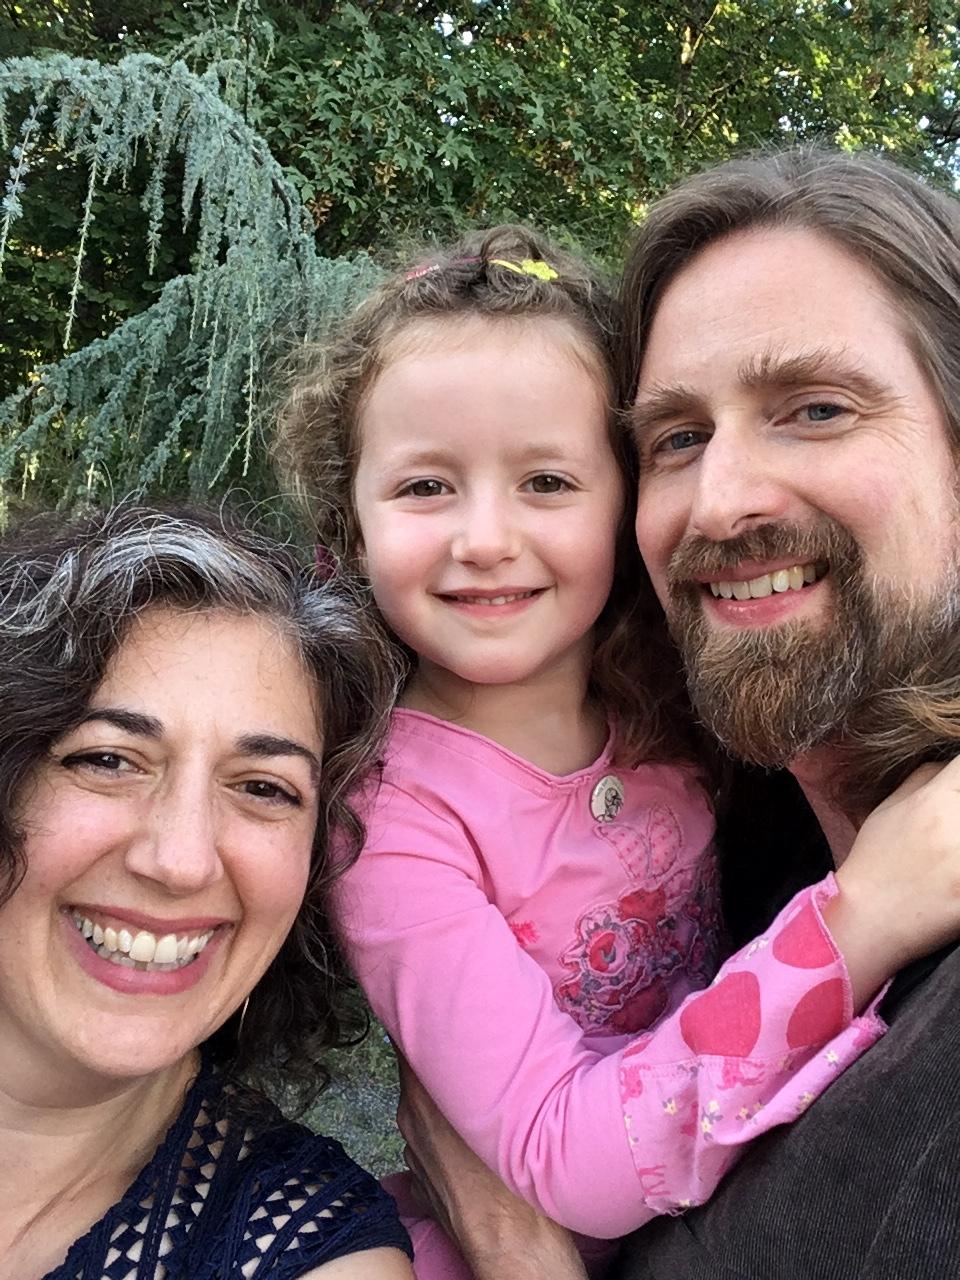 Claudia, River, and John summer 2017.